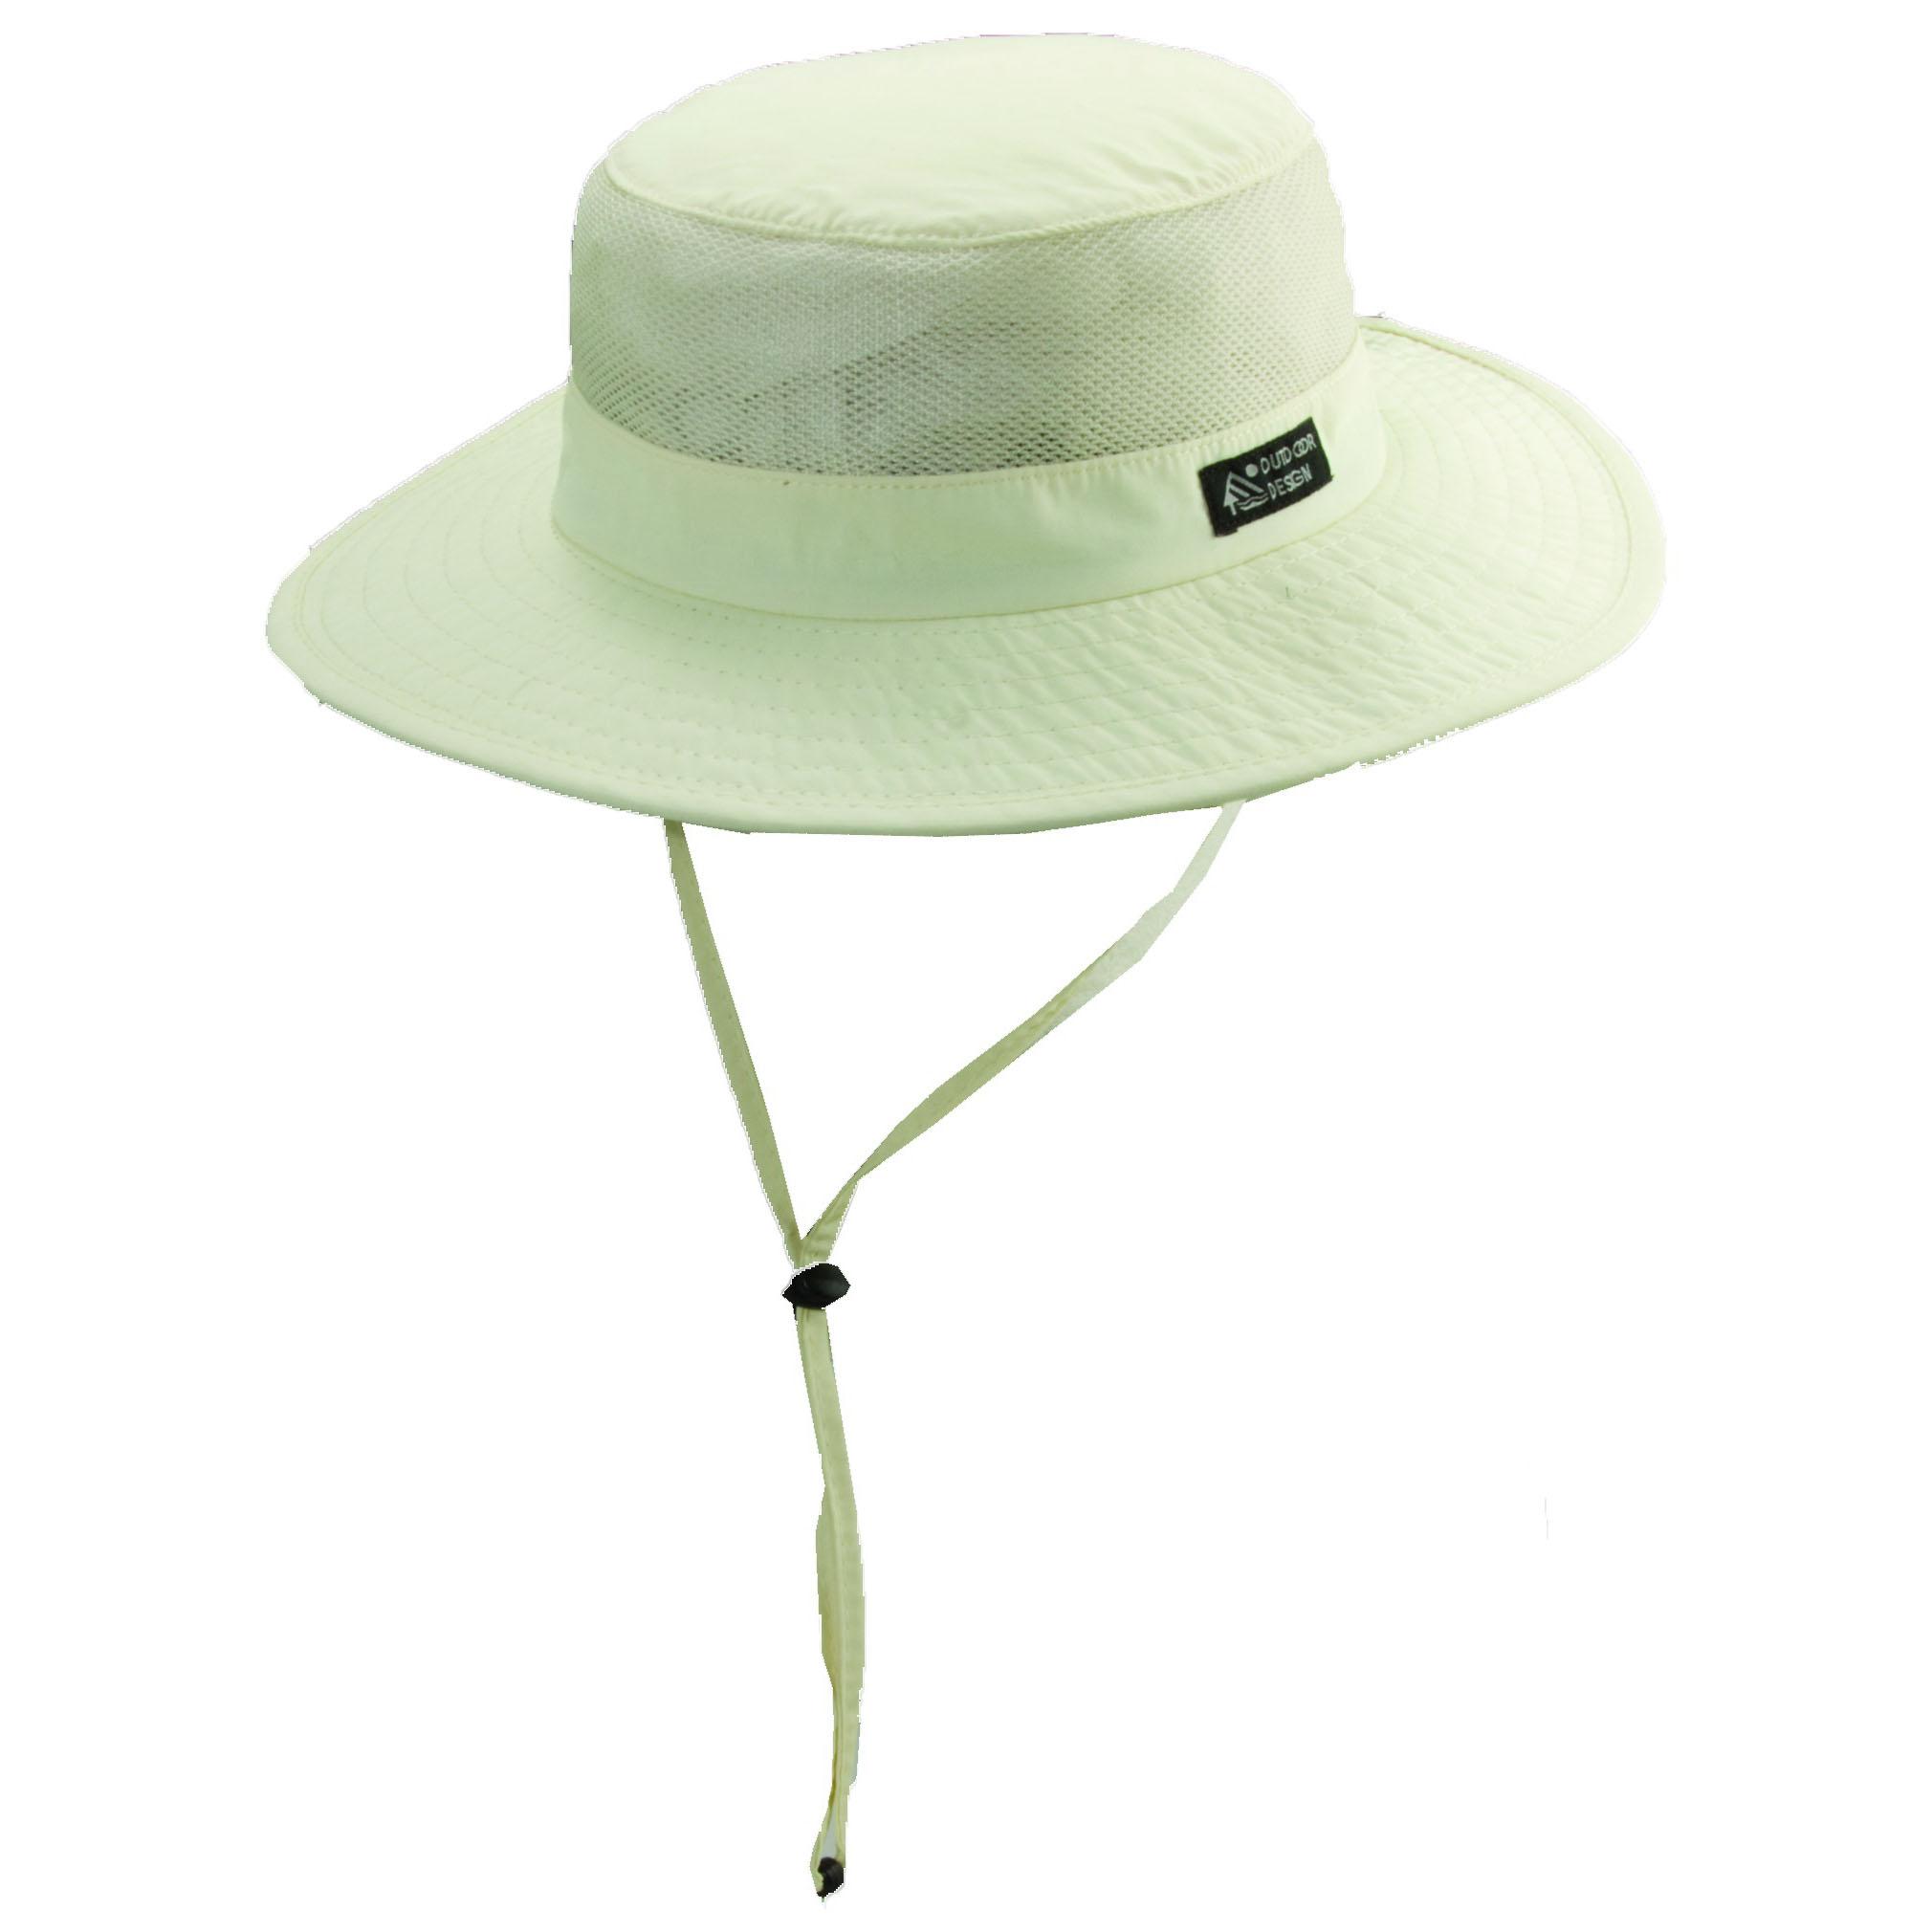 9ecb0be12d086 Supplex Nylon Boonie Hat with Mesh Sidewall Ivory